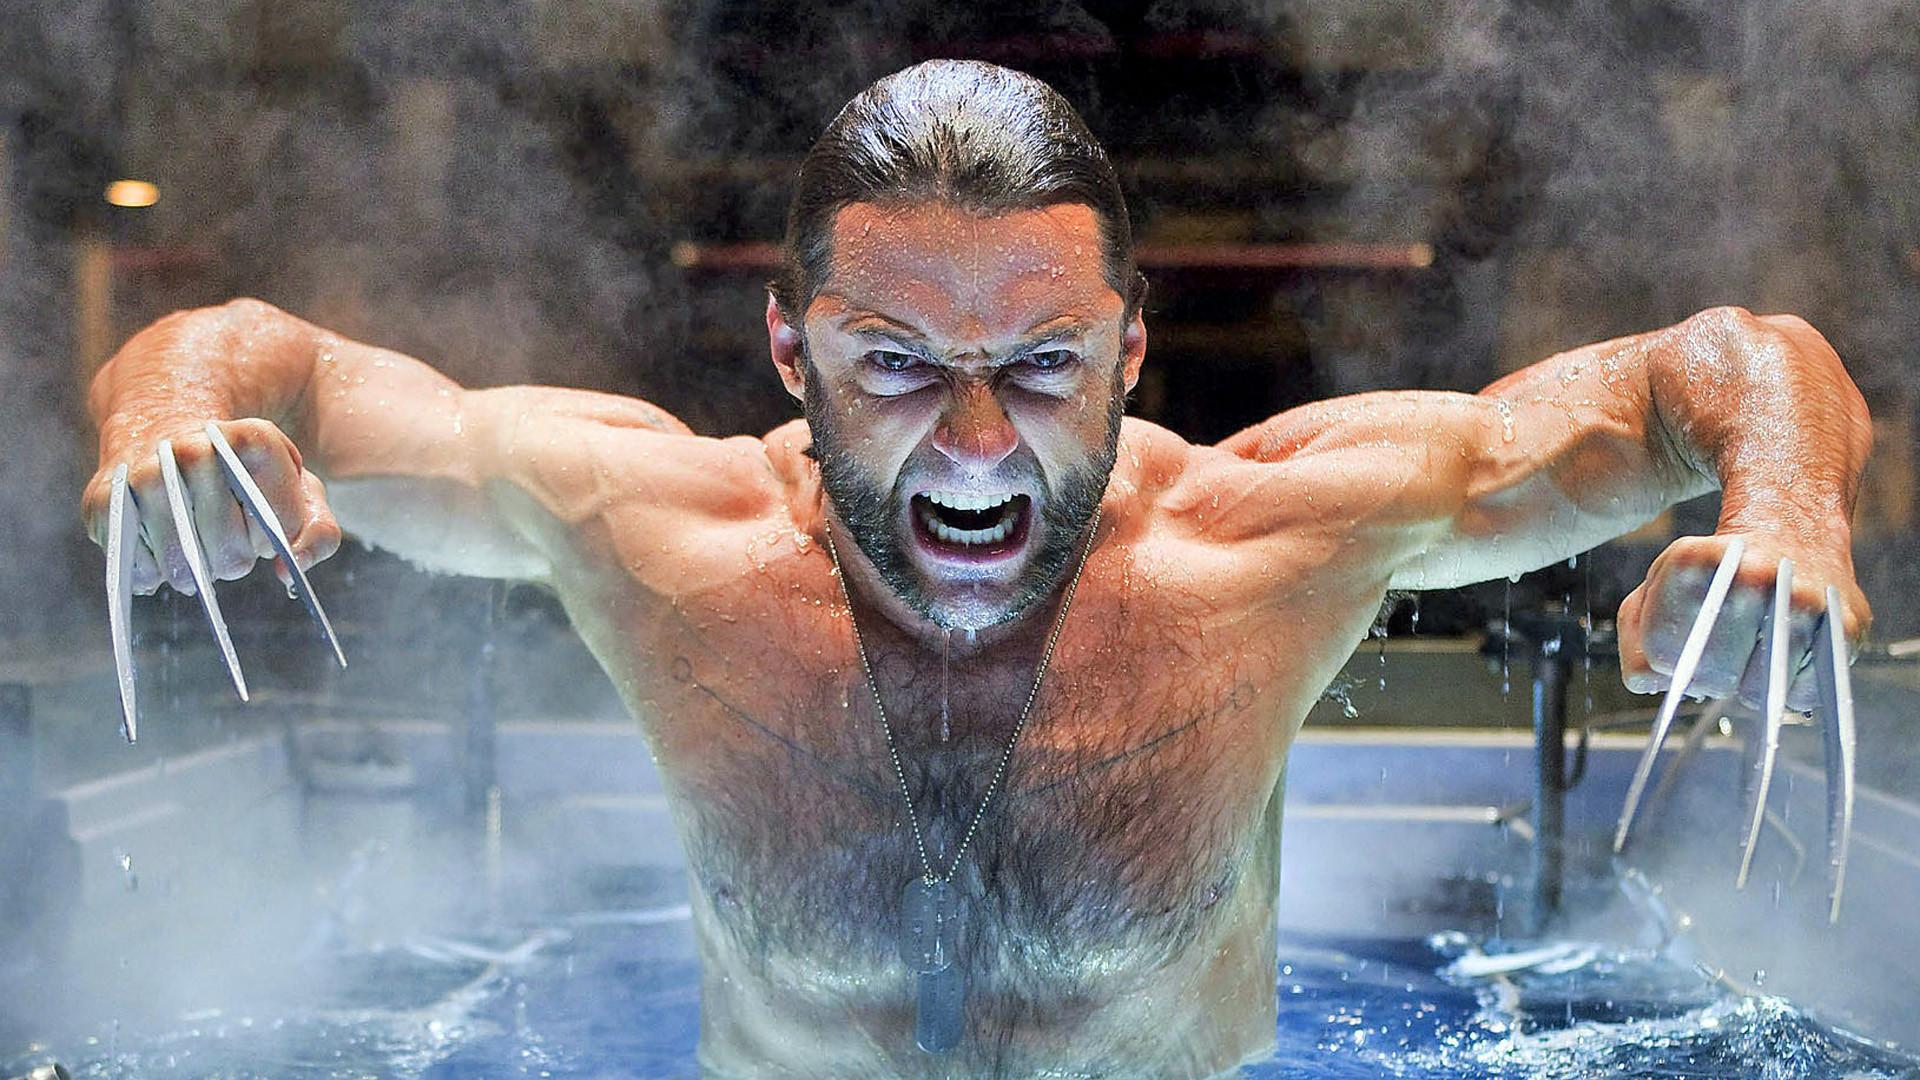 X Men Origins Wolverine Full HD Wallpaper And Background Image